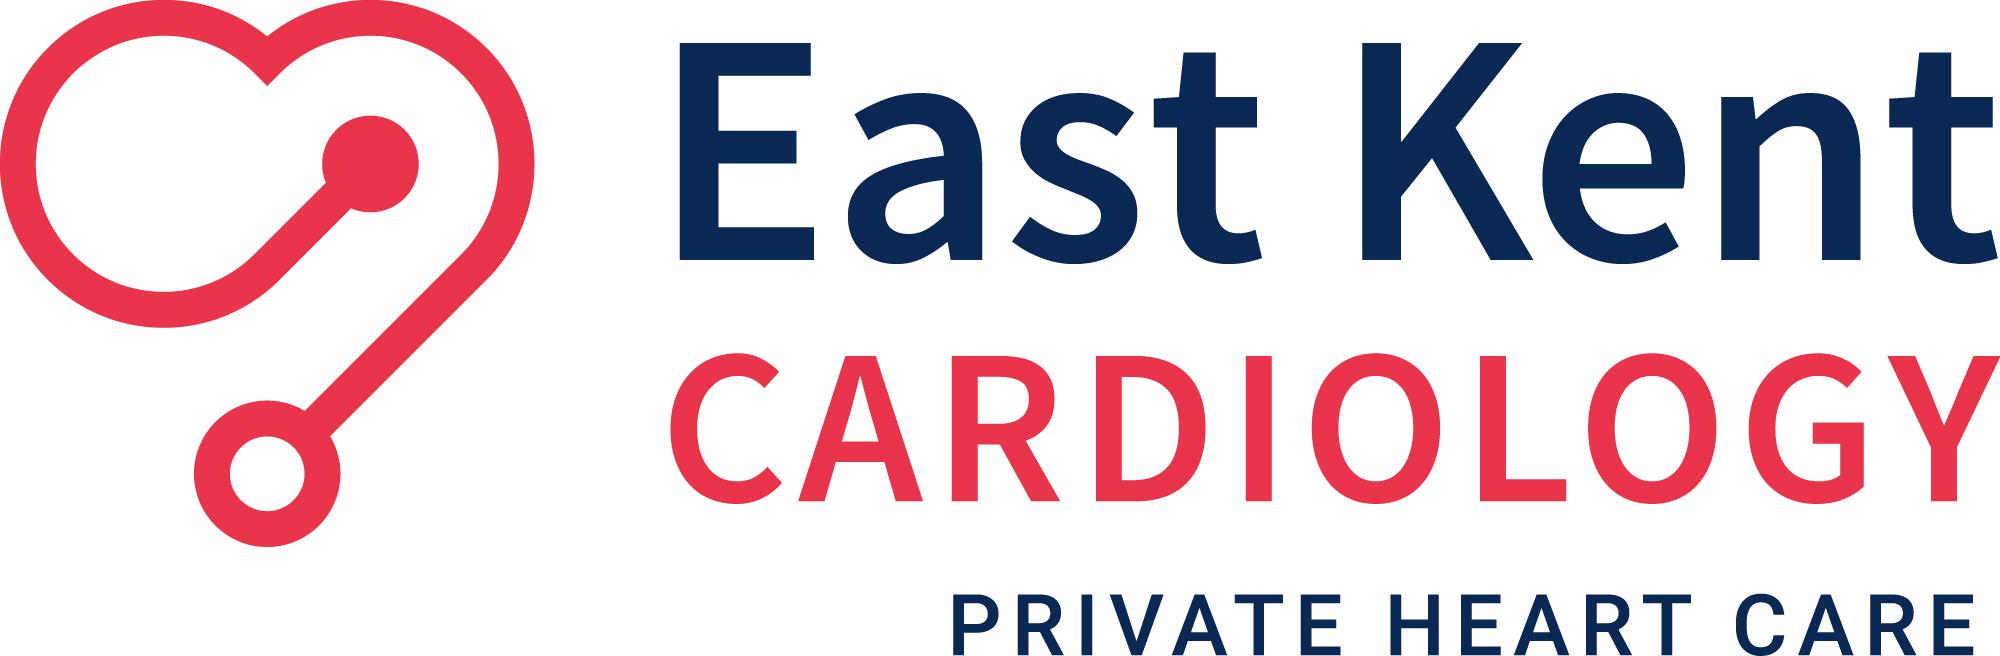 East Kent Cardiology - Dr James Rosengarten company logo